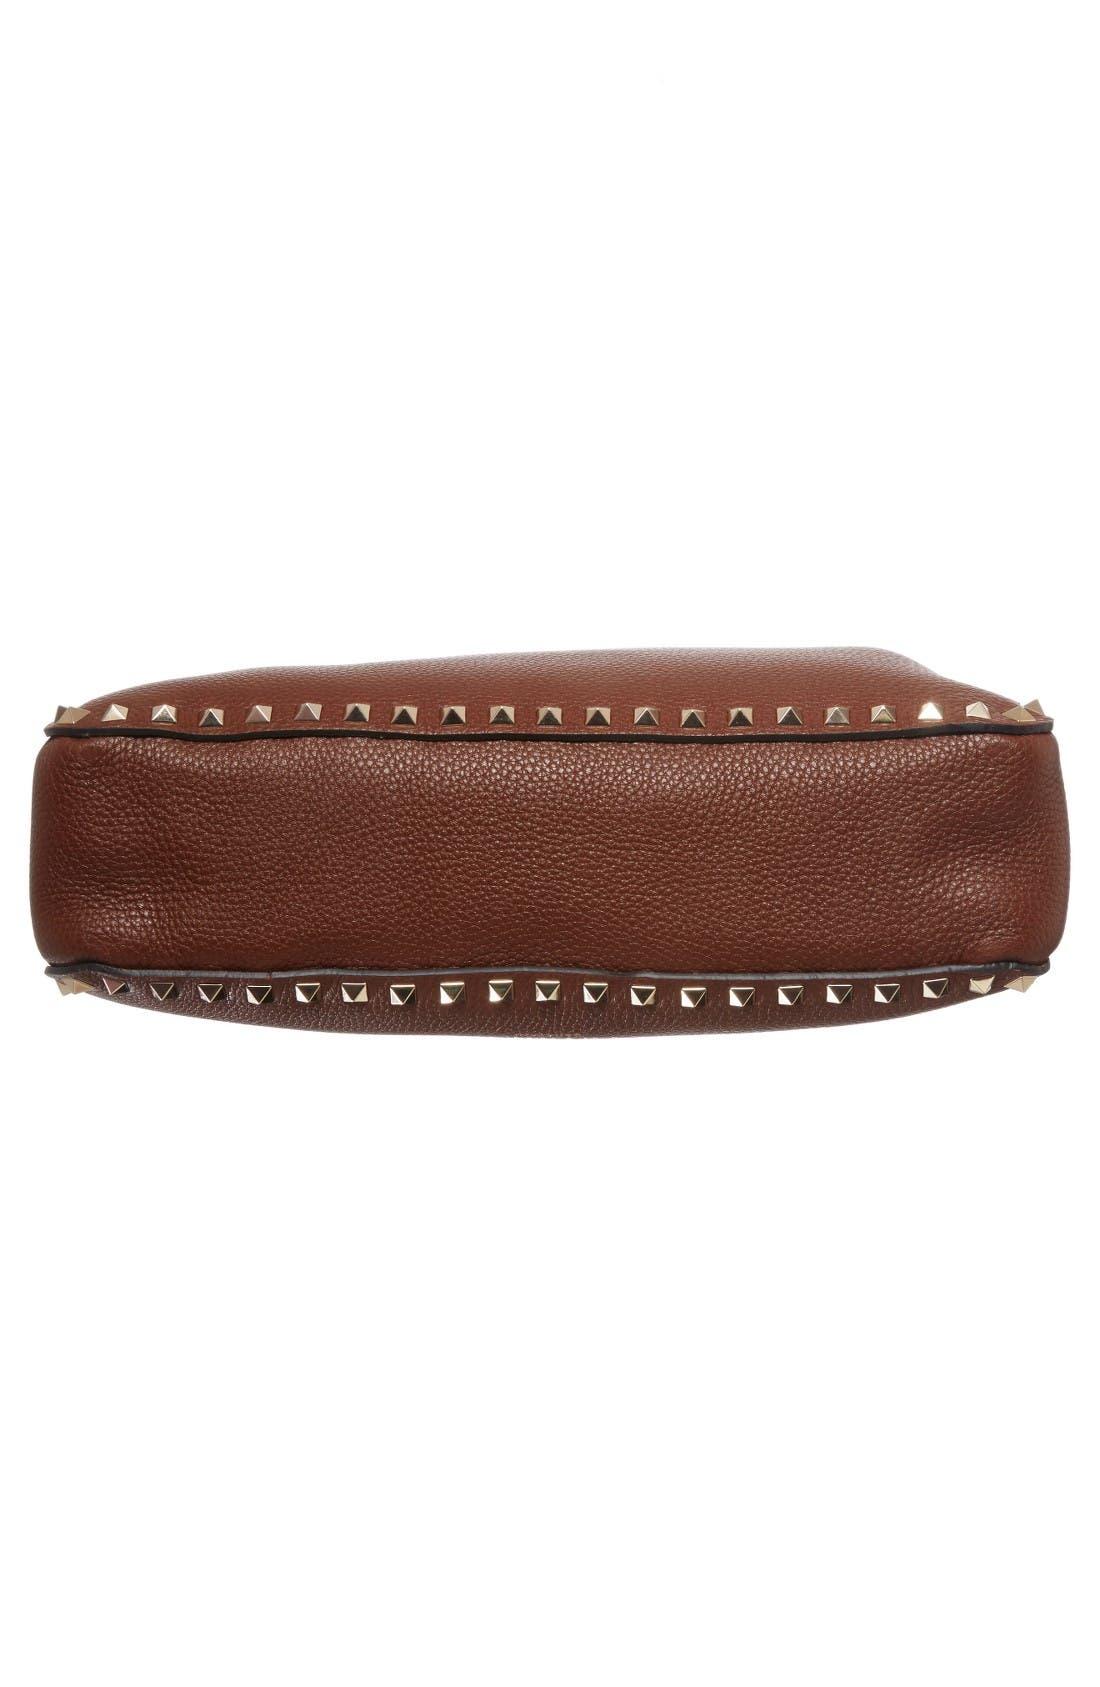 Alternate Image 5  - Valentino Vitello Rockstud Leather Hobo